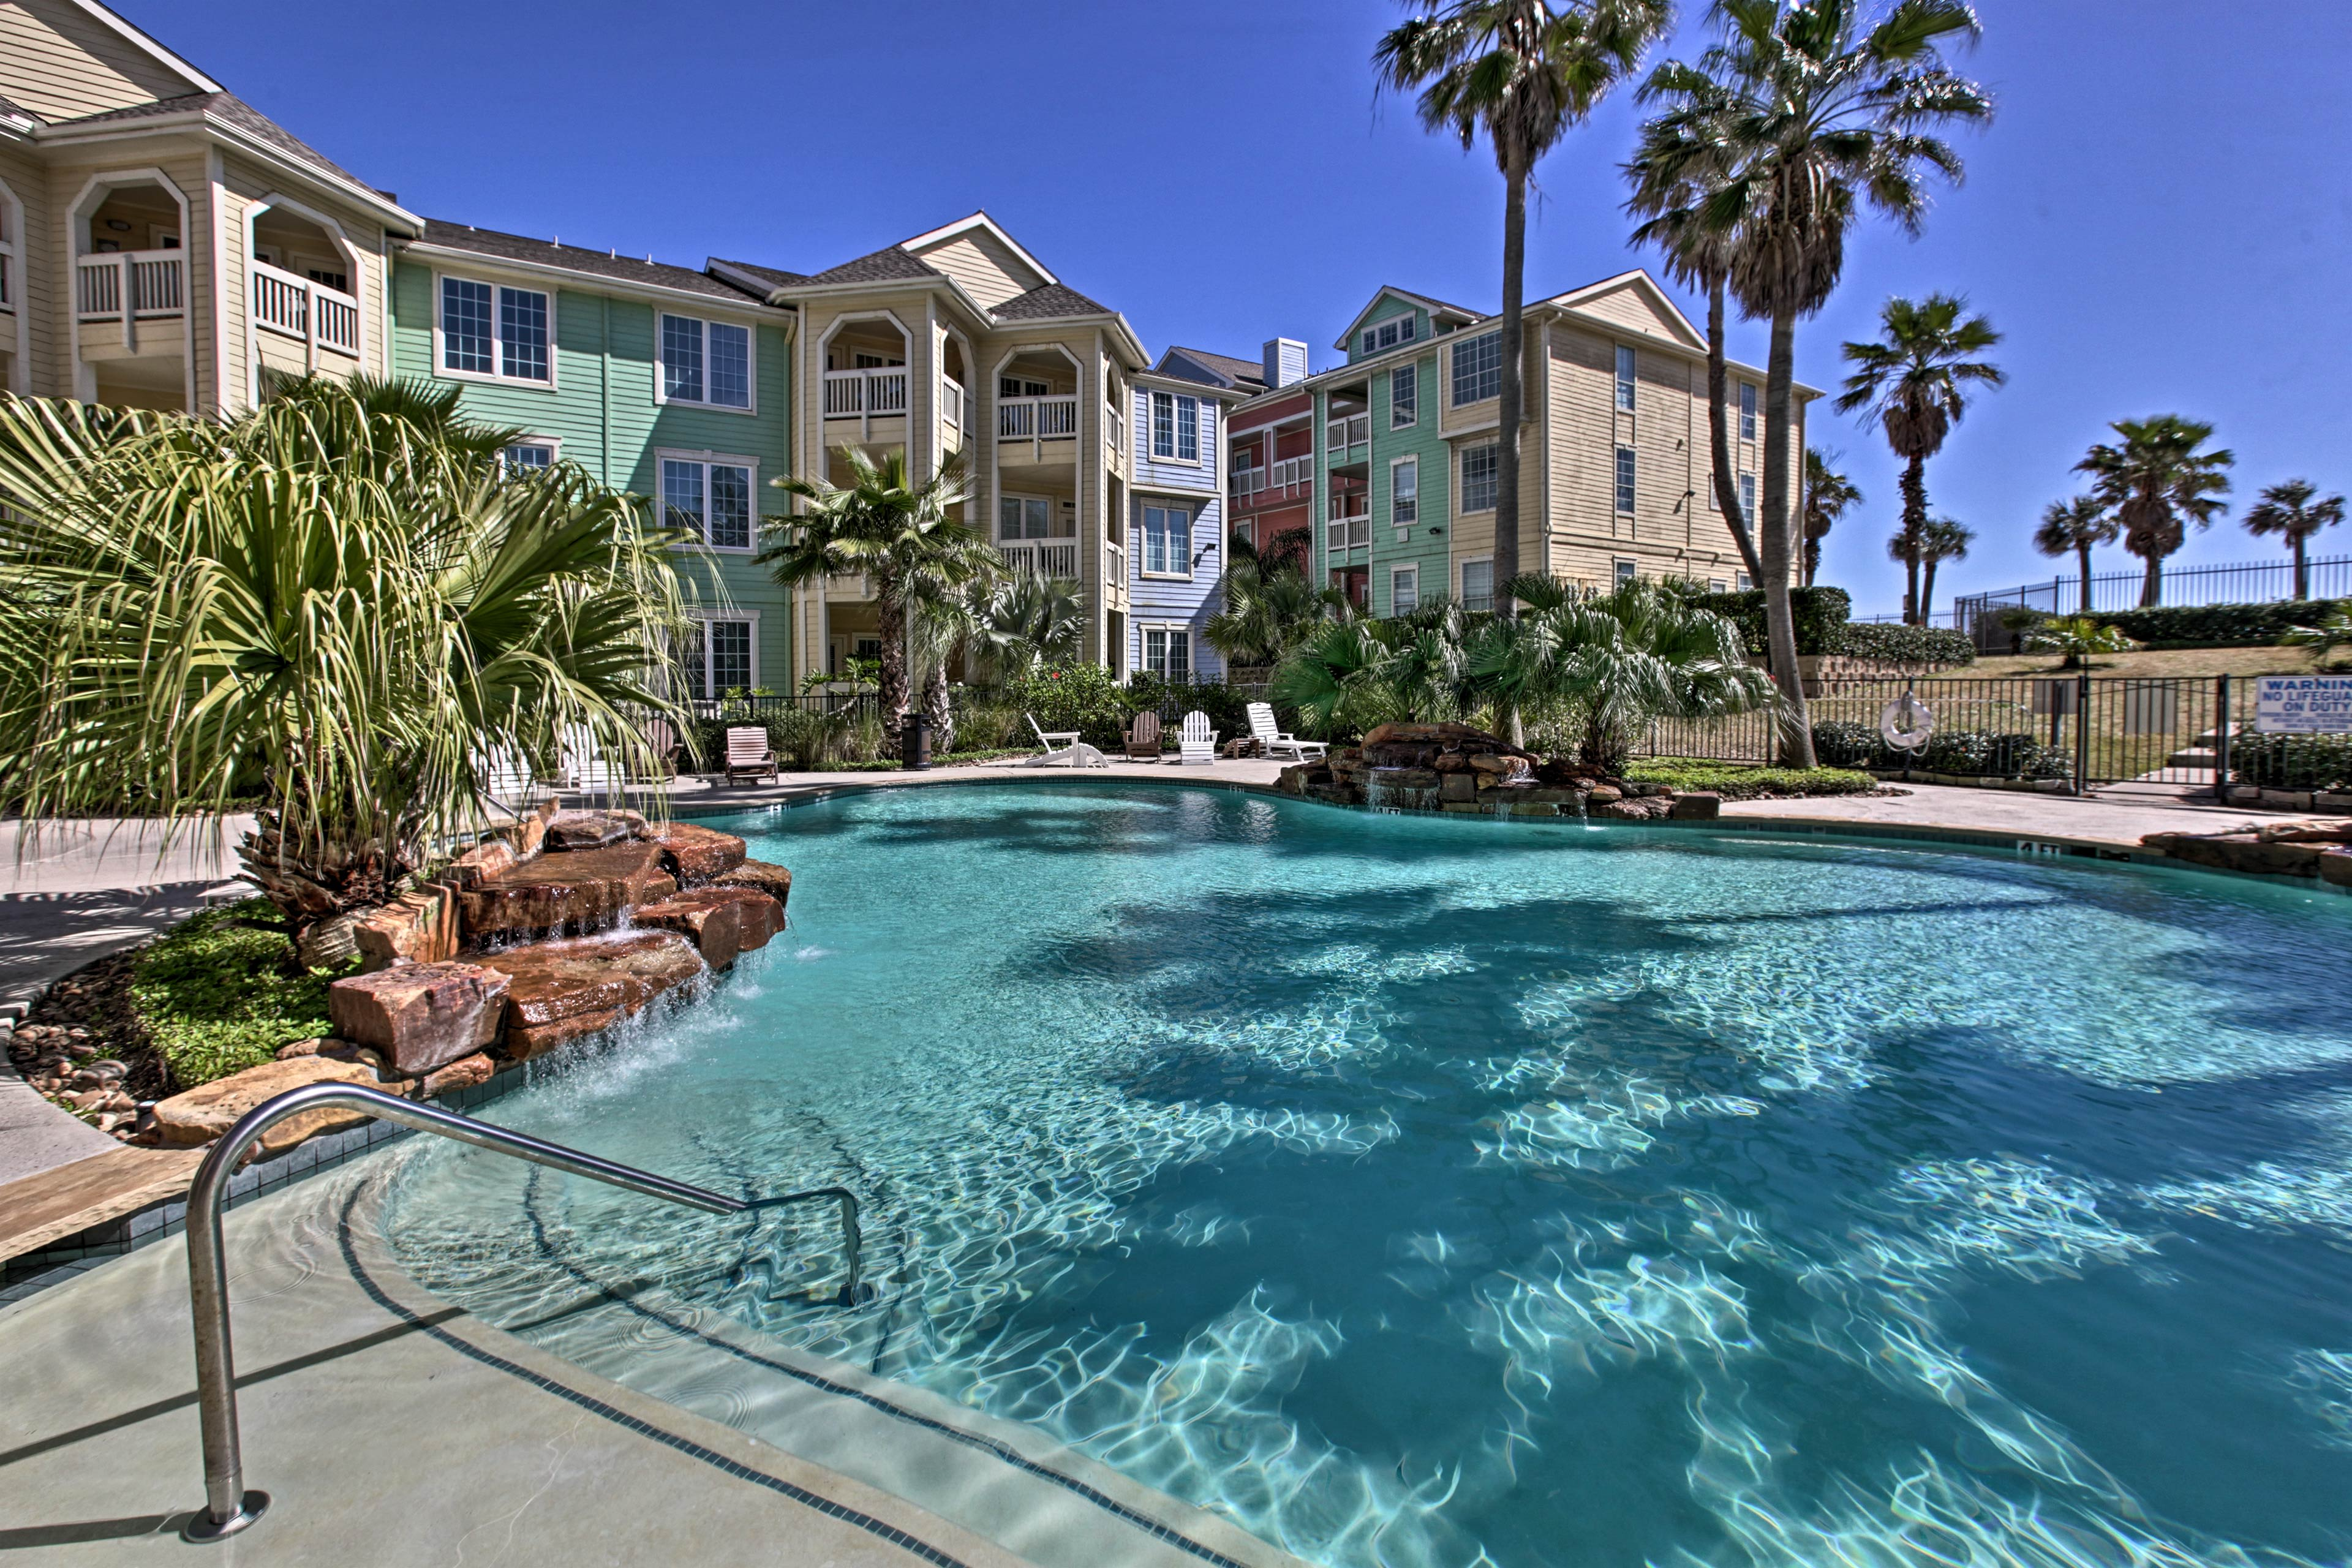 When you stay at Dawn Beach Condos, enjoy an array of luxury amenities.